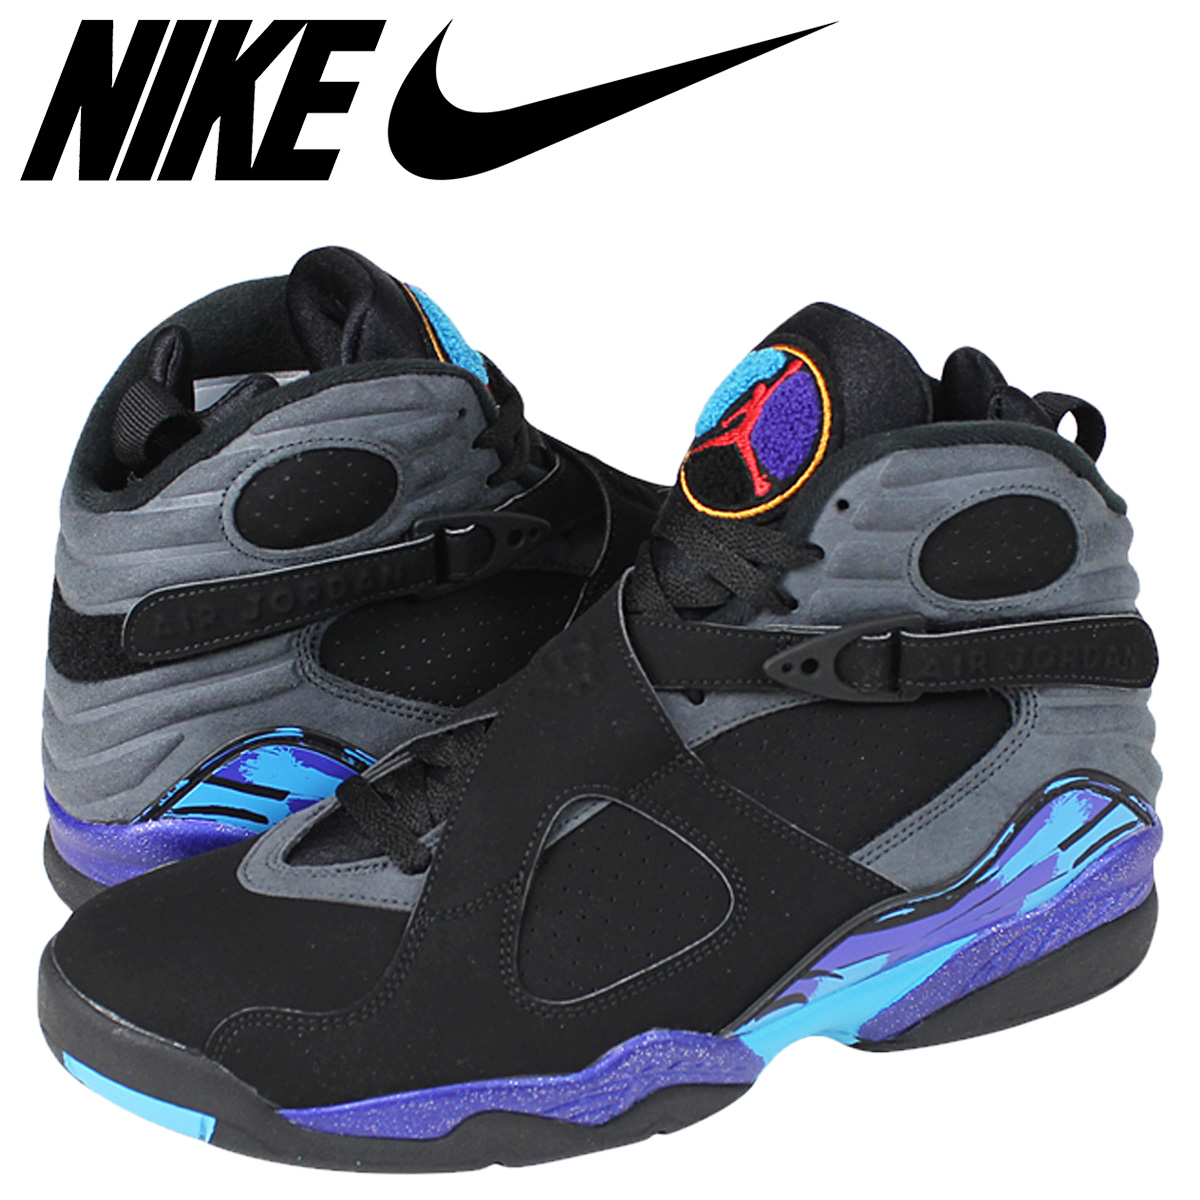 8b4883c53dc NIKE Nike Air Jordan 8 nostalgic sneakers AIR JORDAN 8 RETRO AQUA aqua  305,381-025 ...